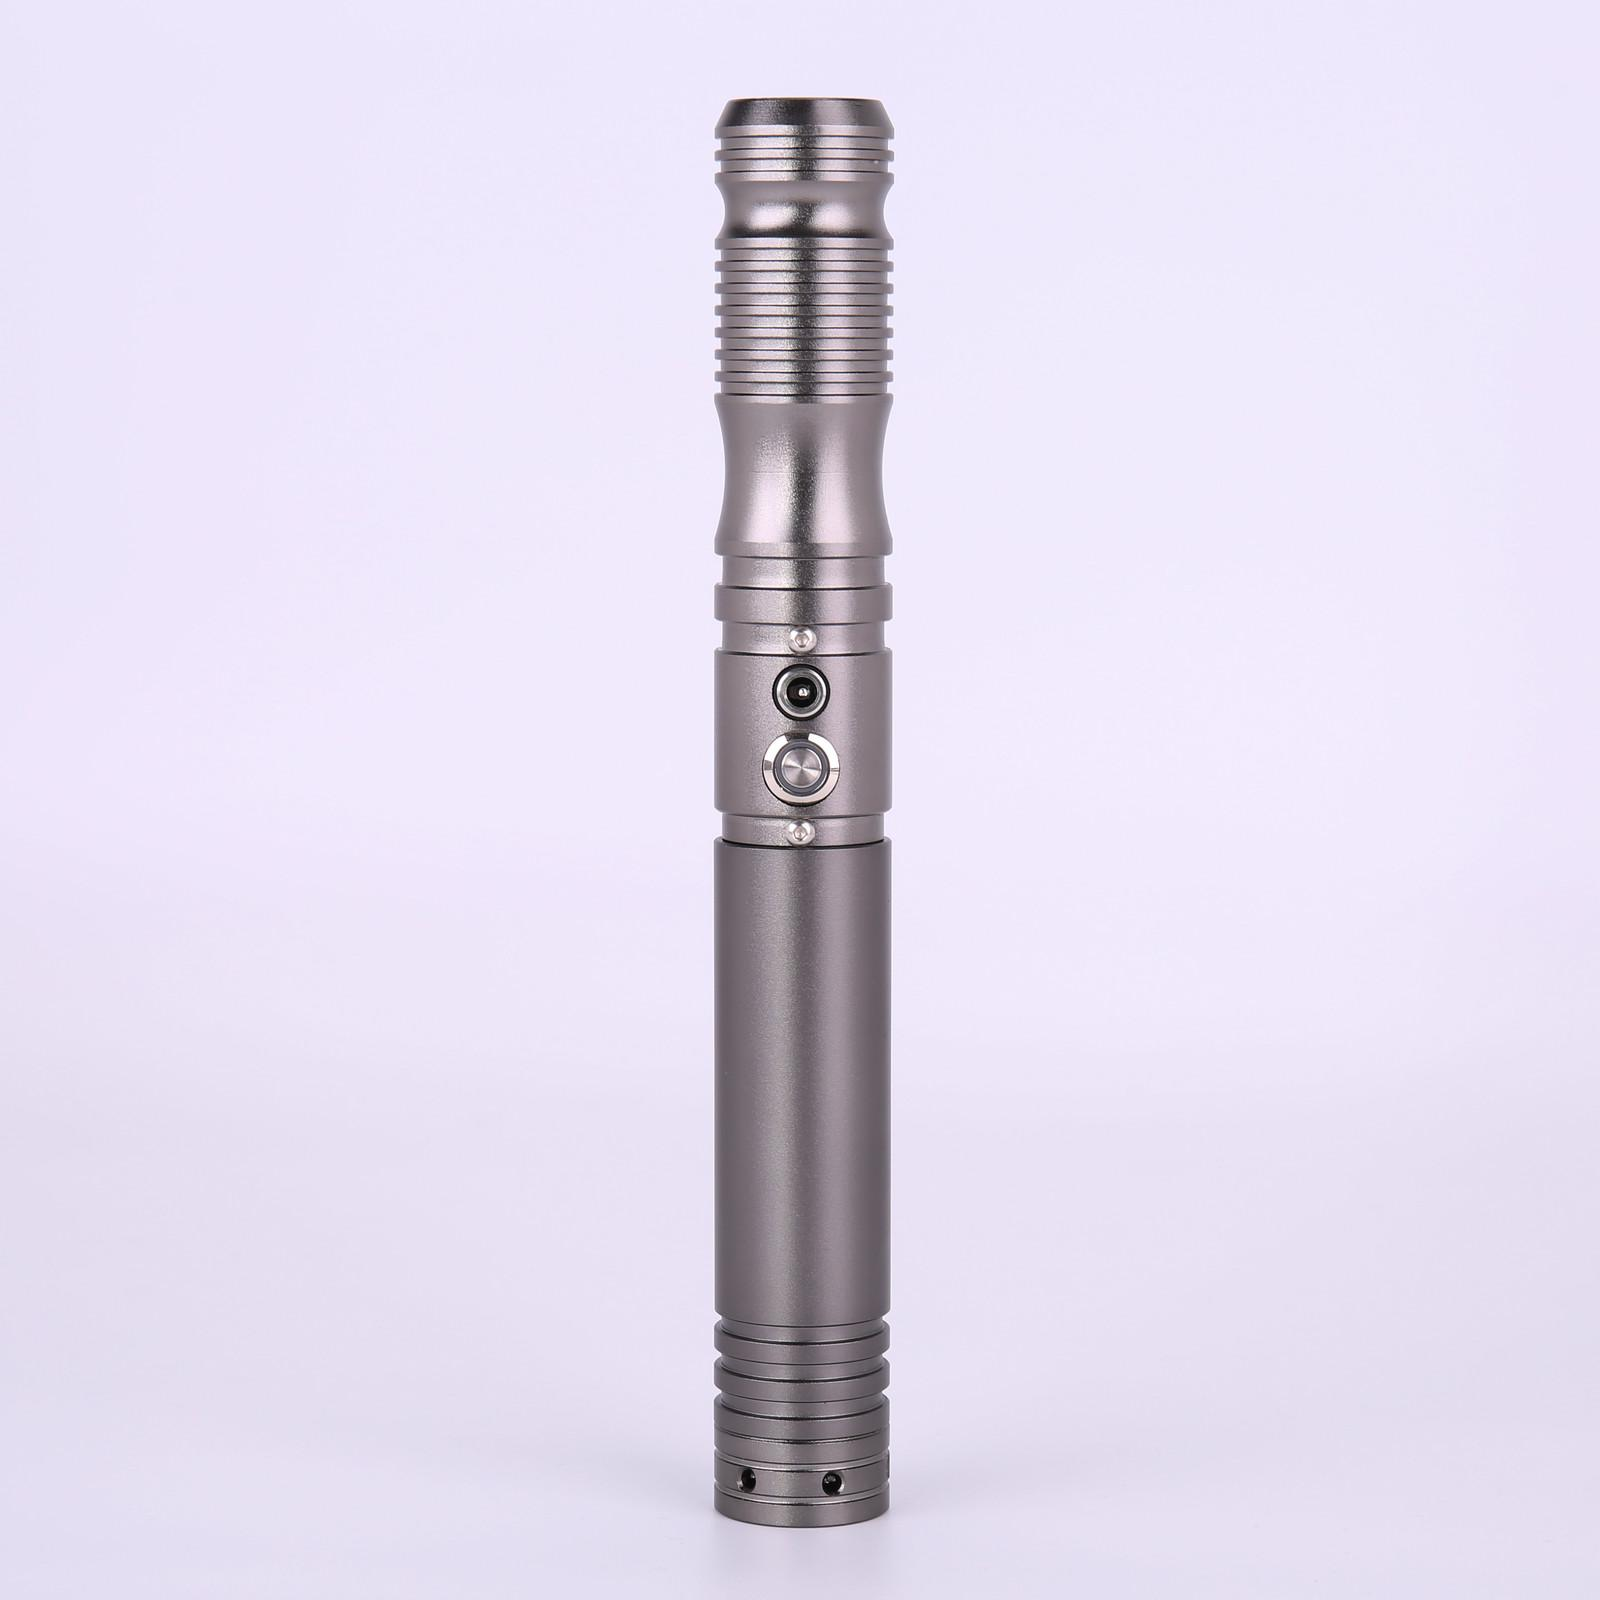 TXQSaber TS013 Ağır Dueling Foc Metal Kolu Lightsaber Force FX 12 Renkler 6 Ses Yazı Tipleri Blaster Kilitleme Işık Kılıç-TS013 Q0113